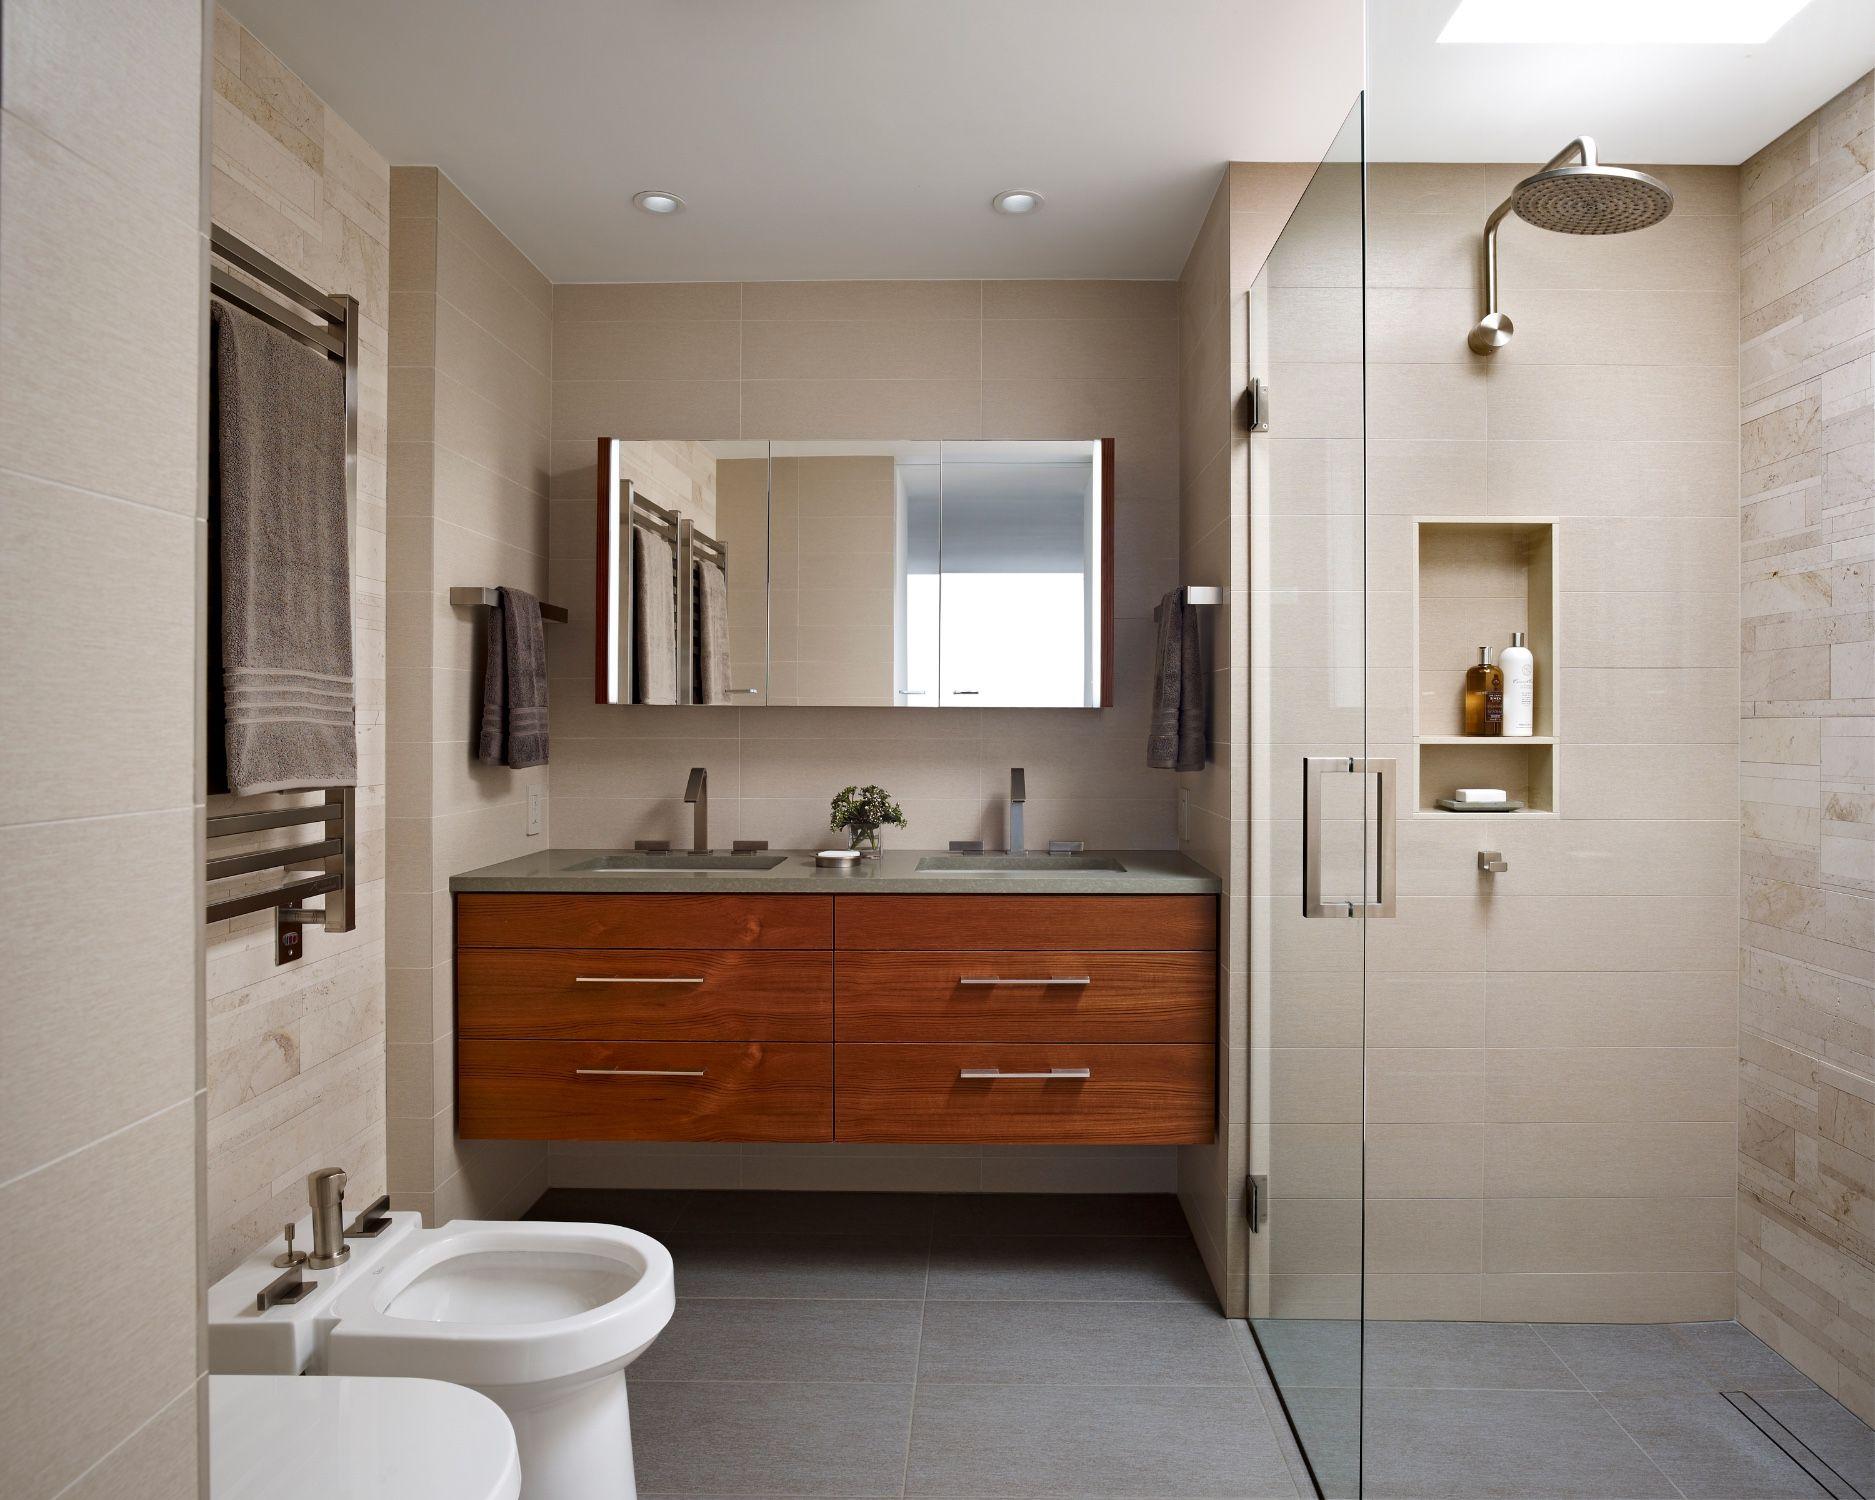 Phenomenal K Yoder Design Locust Street Baths Inzonedesignstudio Interior Chair Design Inzonedesignstudiocom